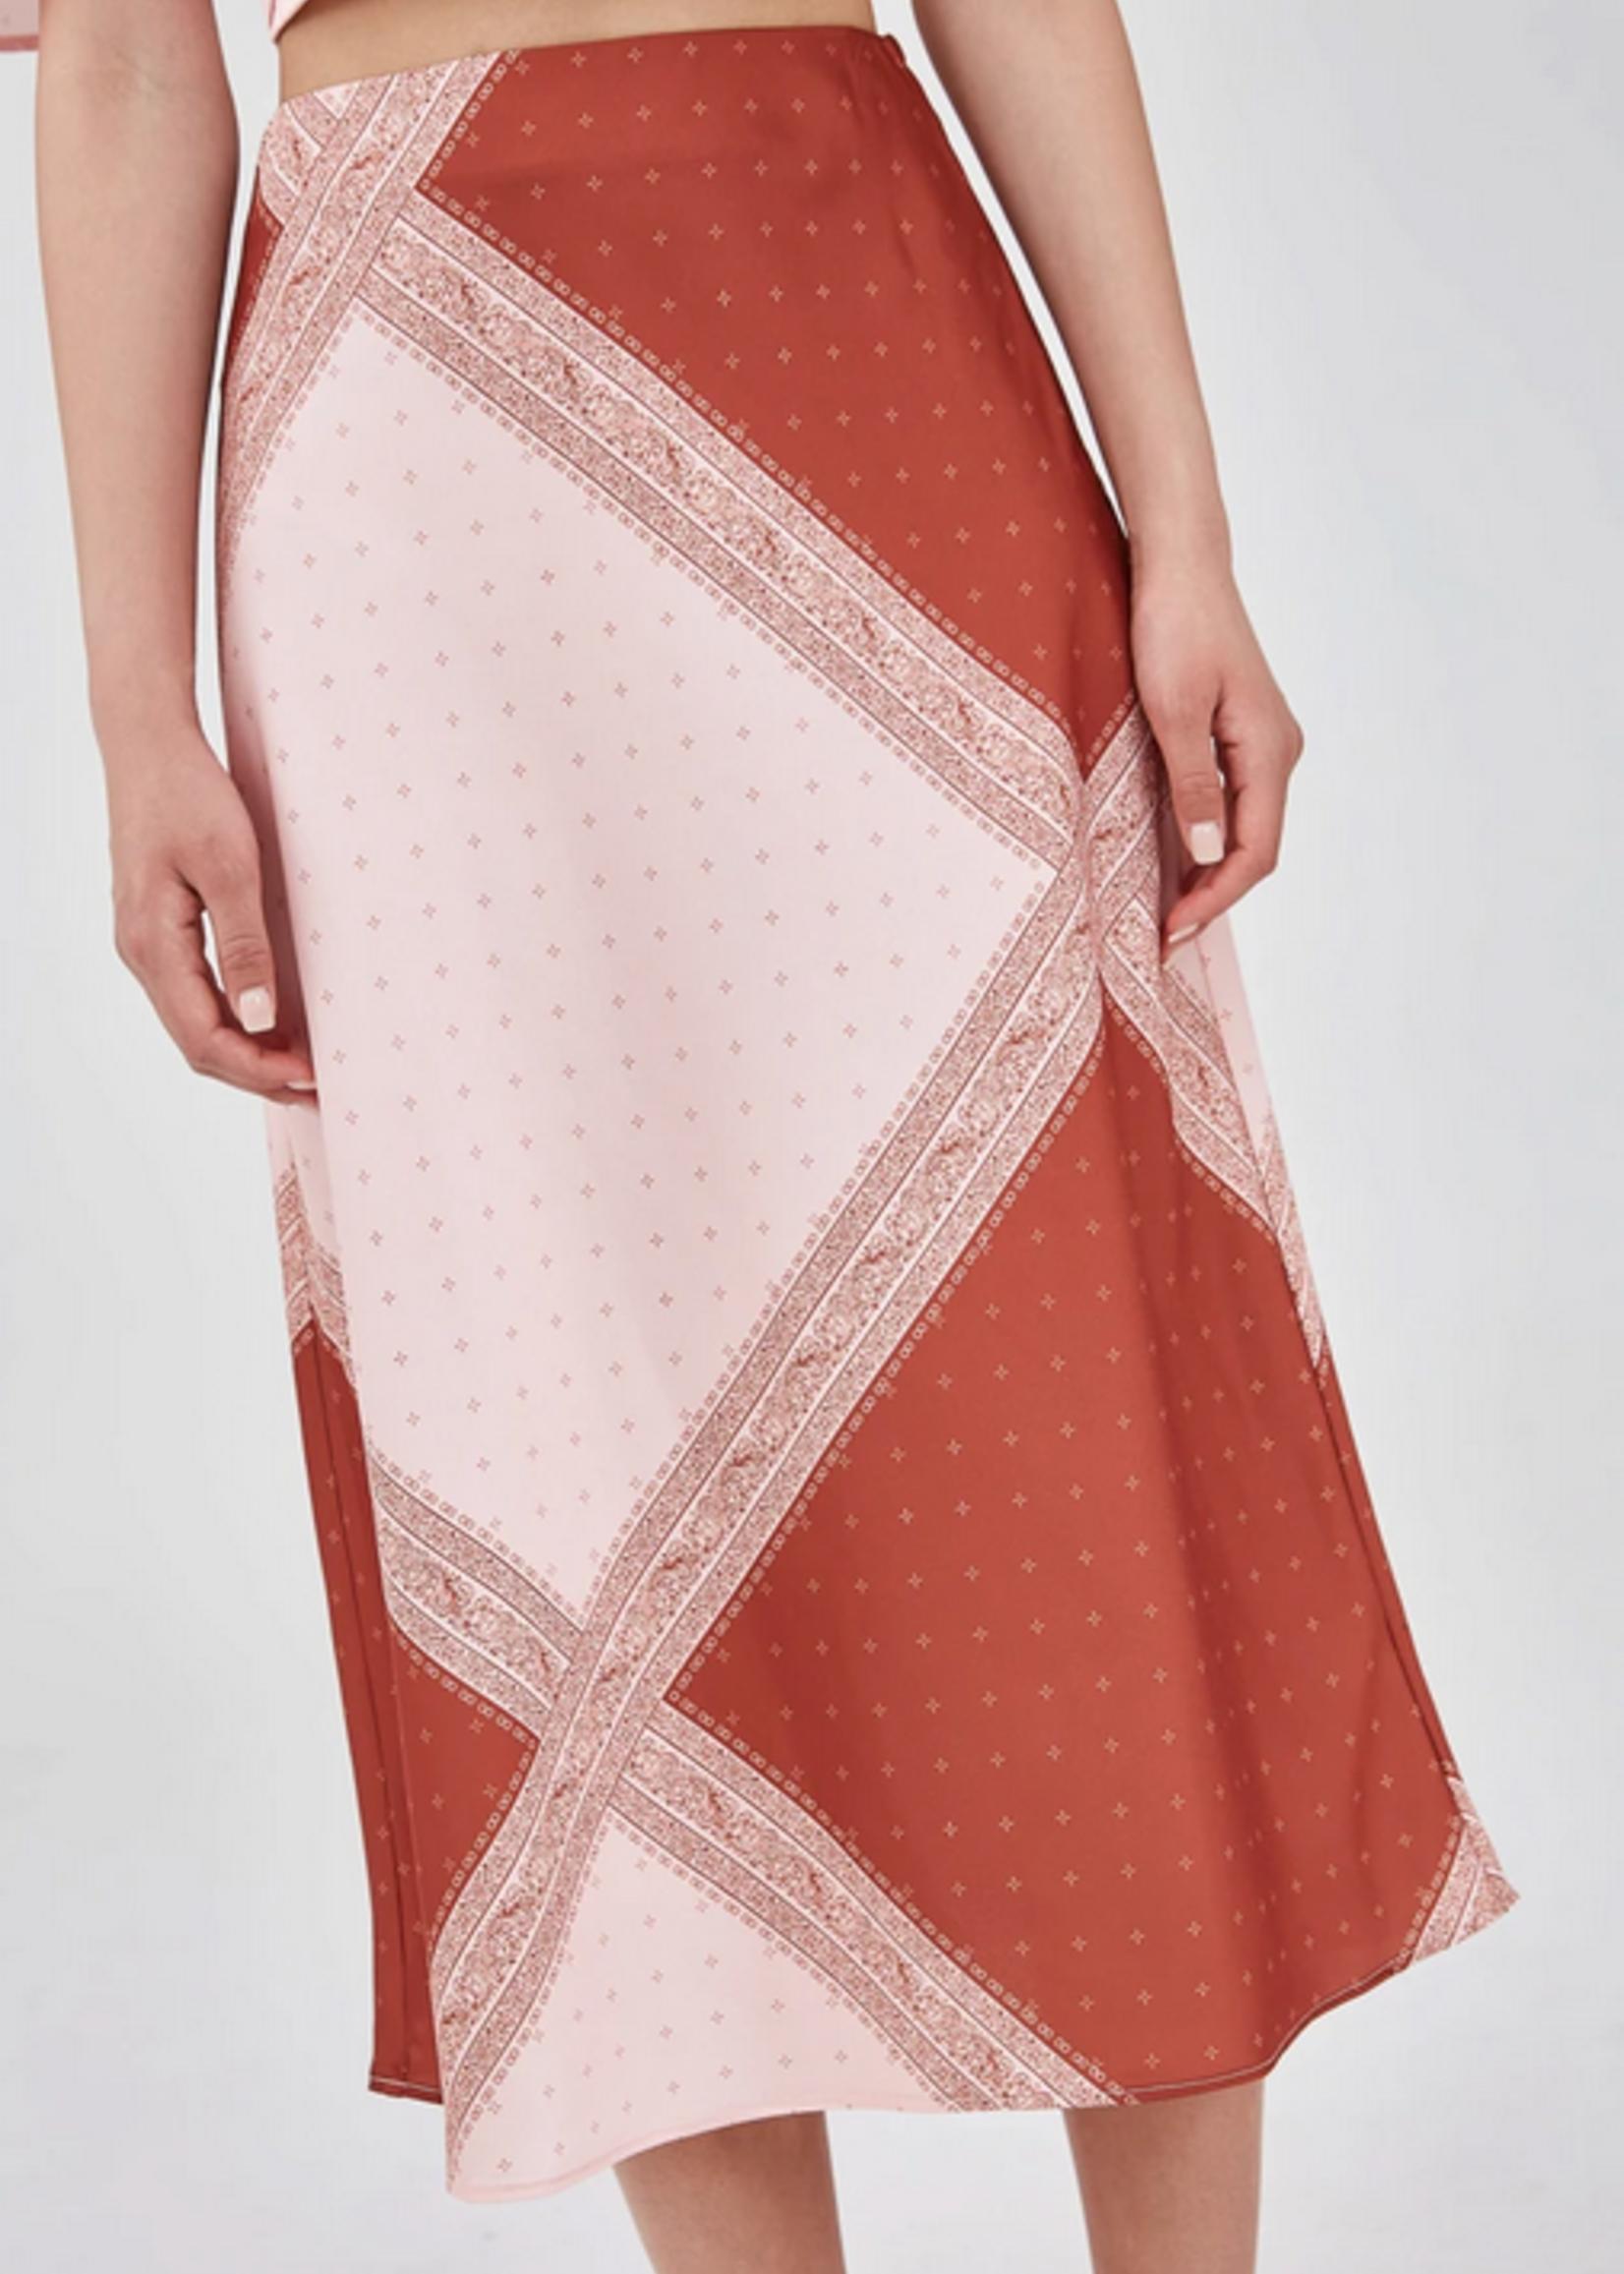 Elitaire Boutique Maya Skirt